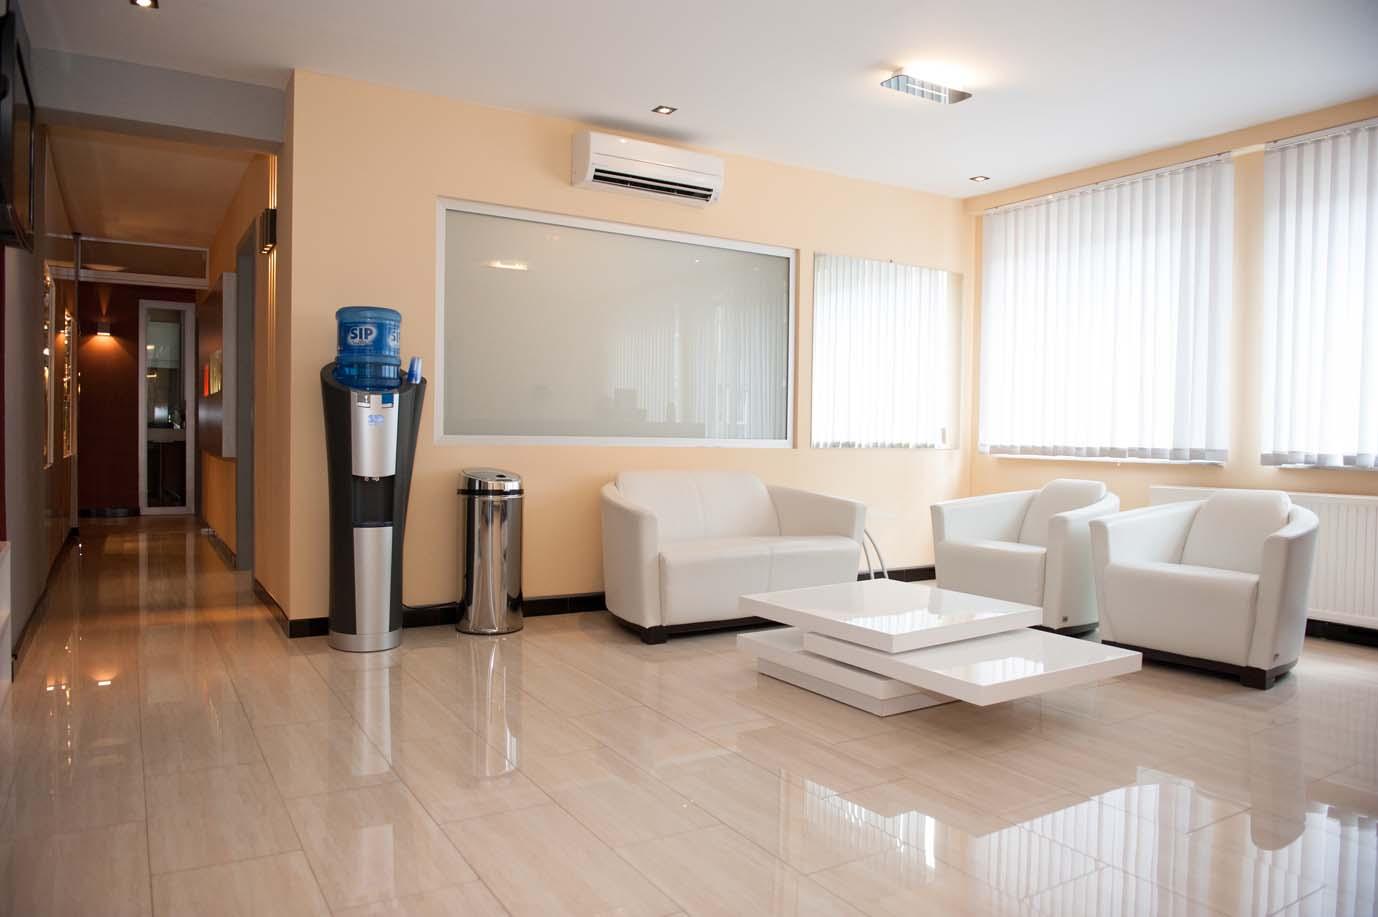 dr patrick mwamba sp cialiste greffe capillaire bruxelles. Black Bedroom Furniture Sets. Home Design Ideas